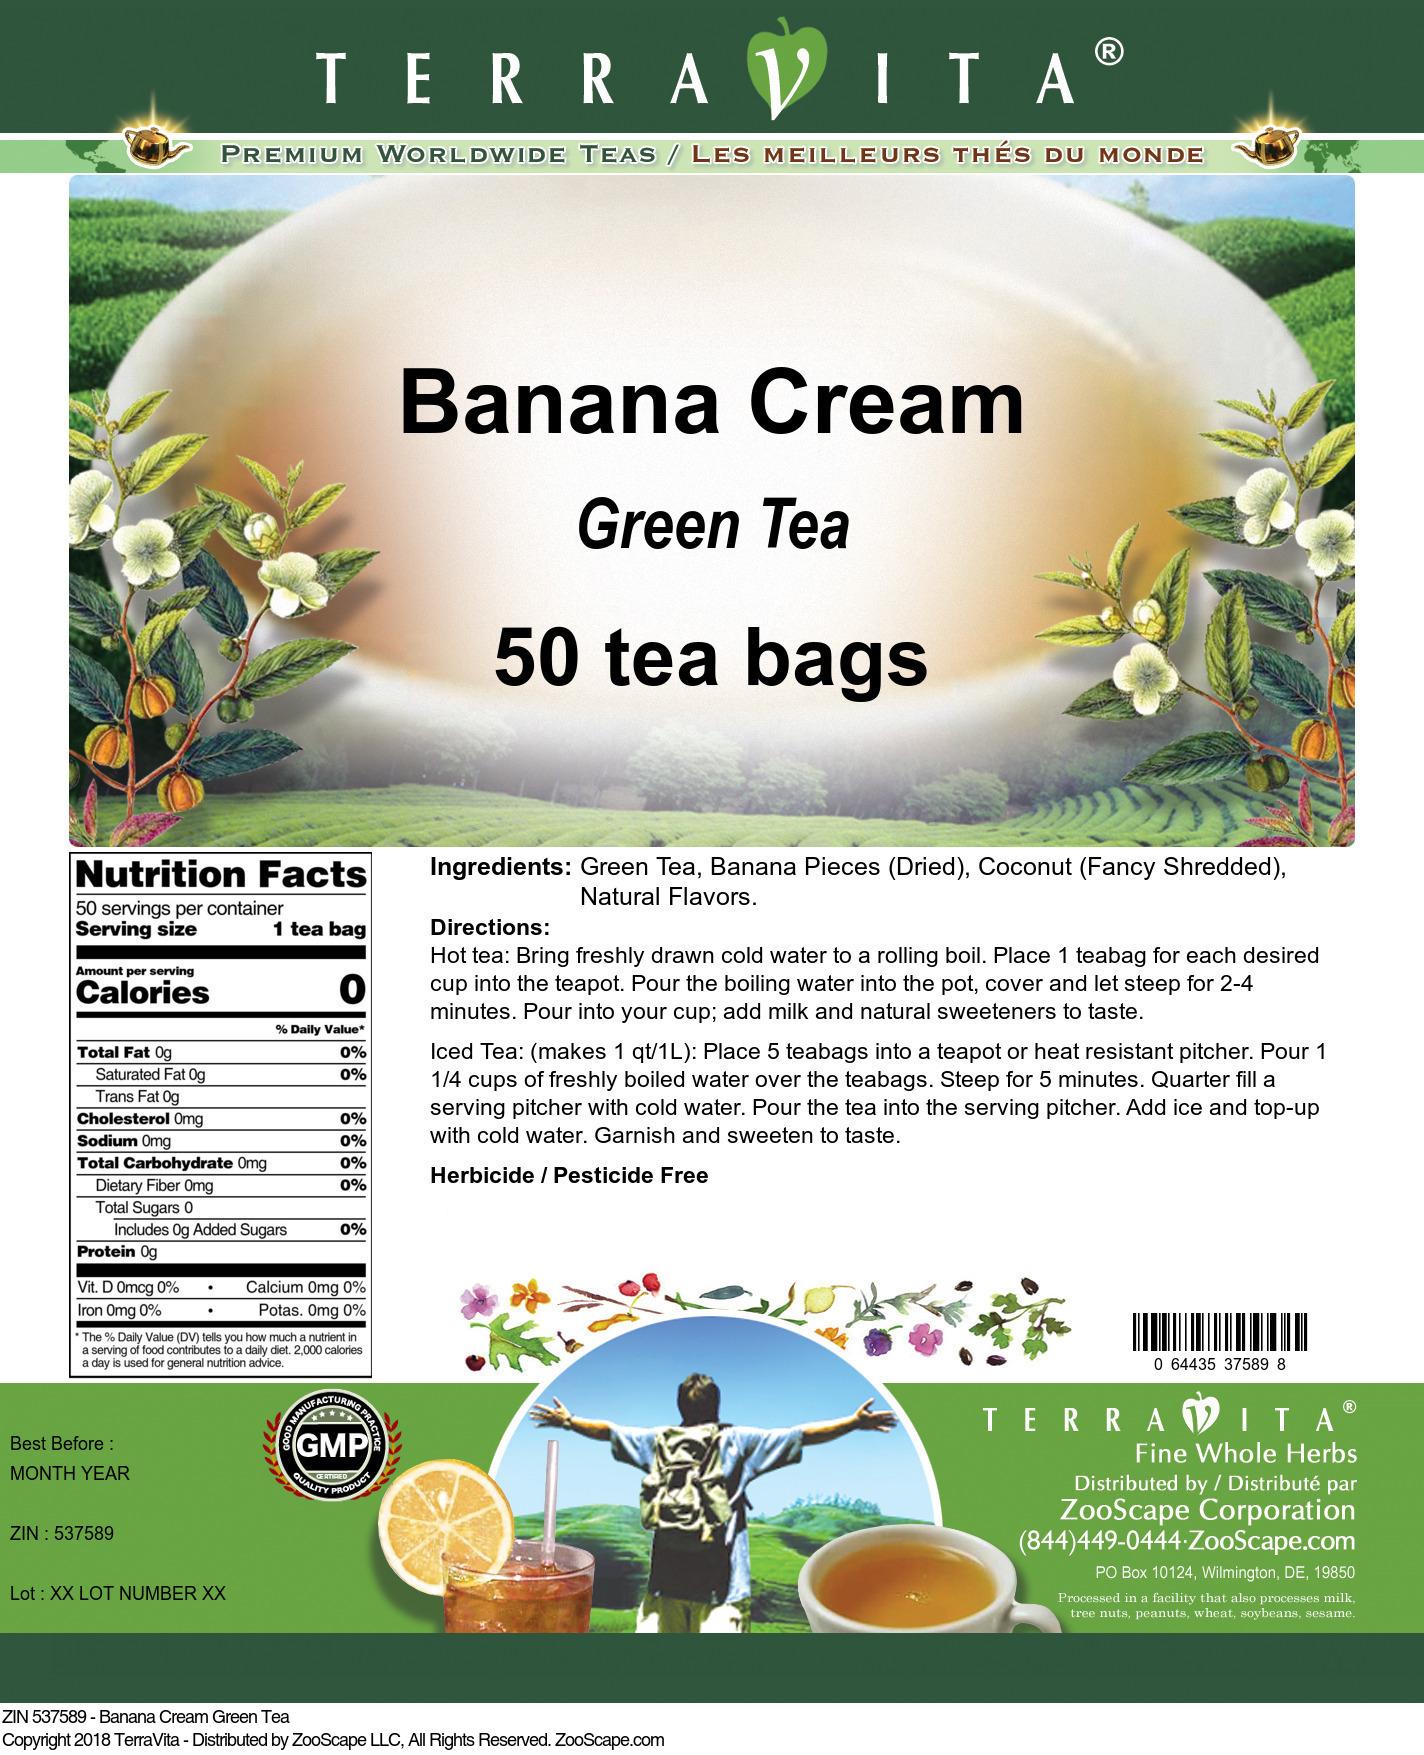 Banana Cream Green Tea